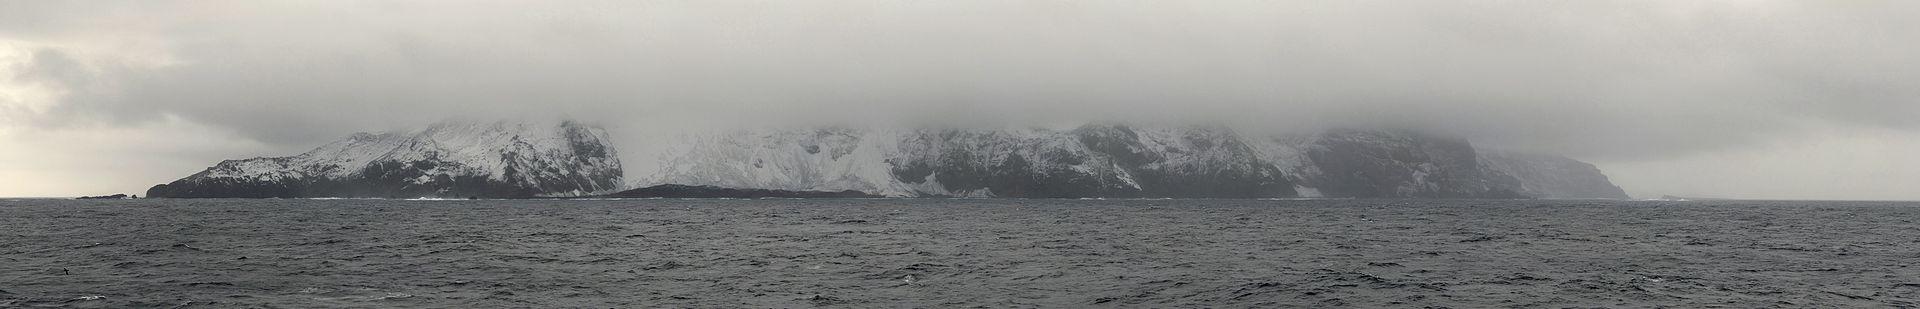 bouvet-island-west-coast